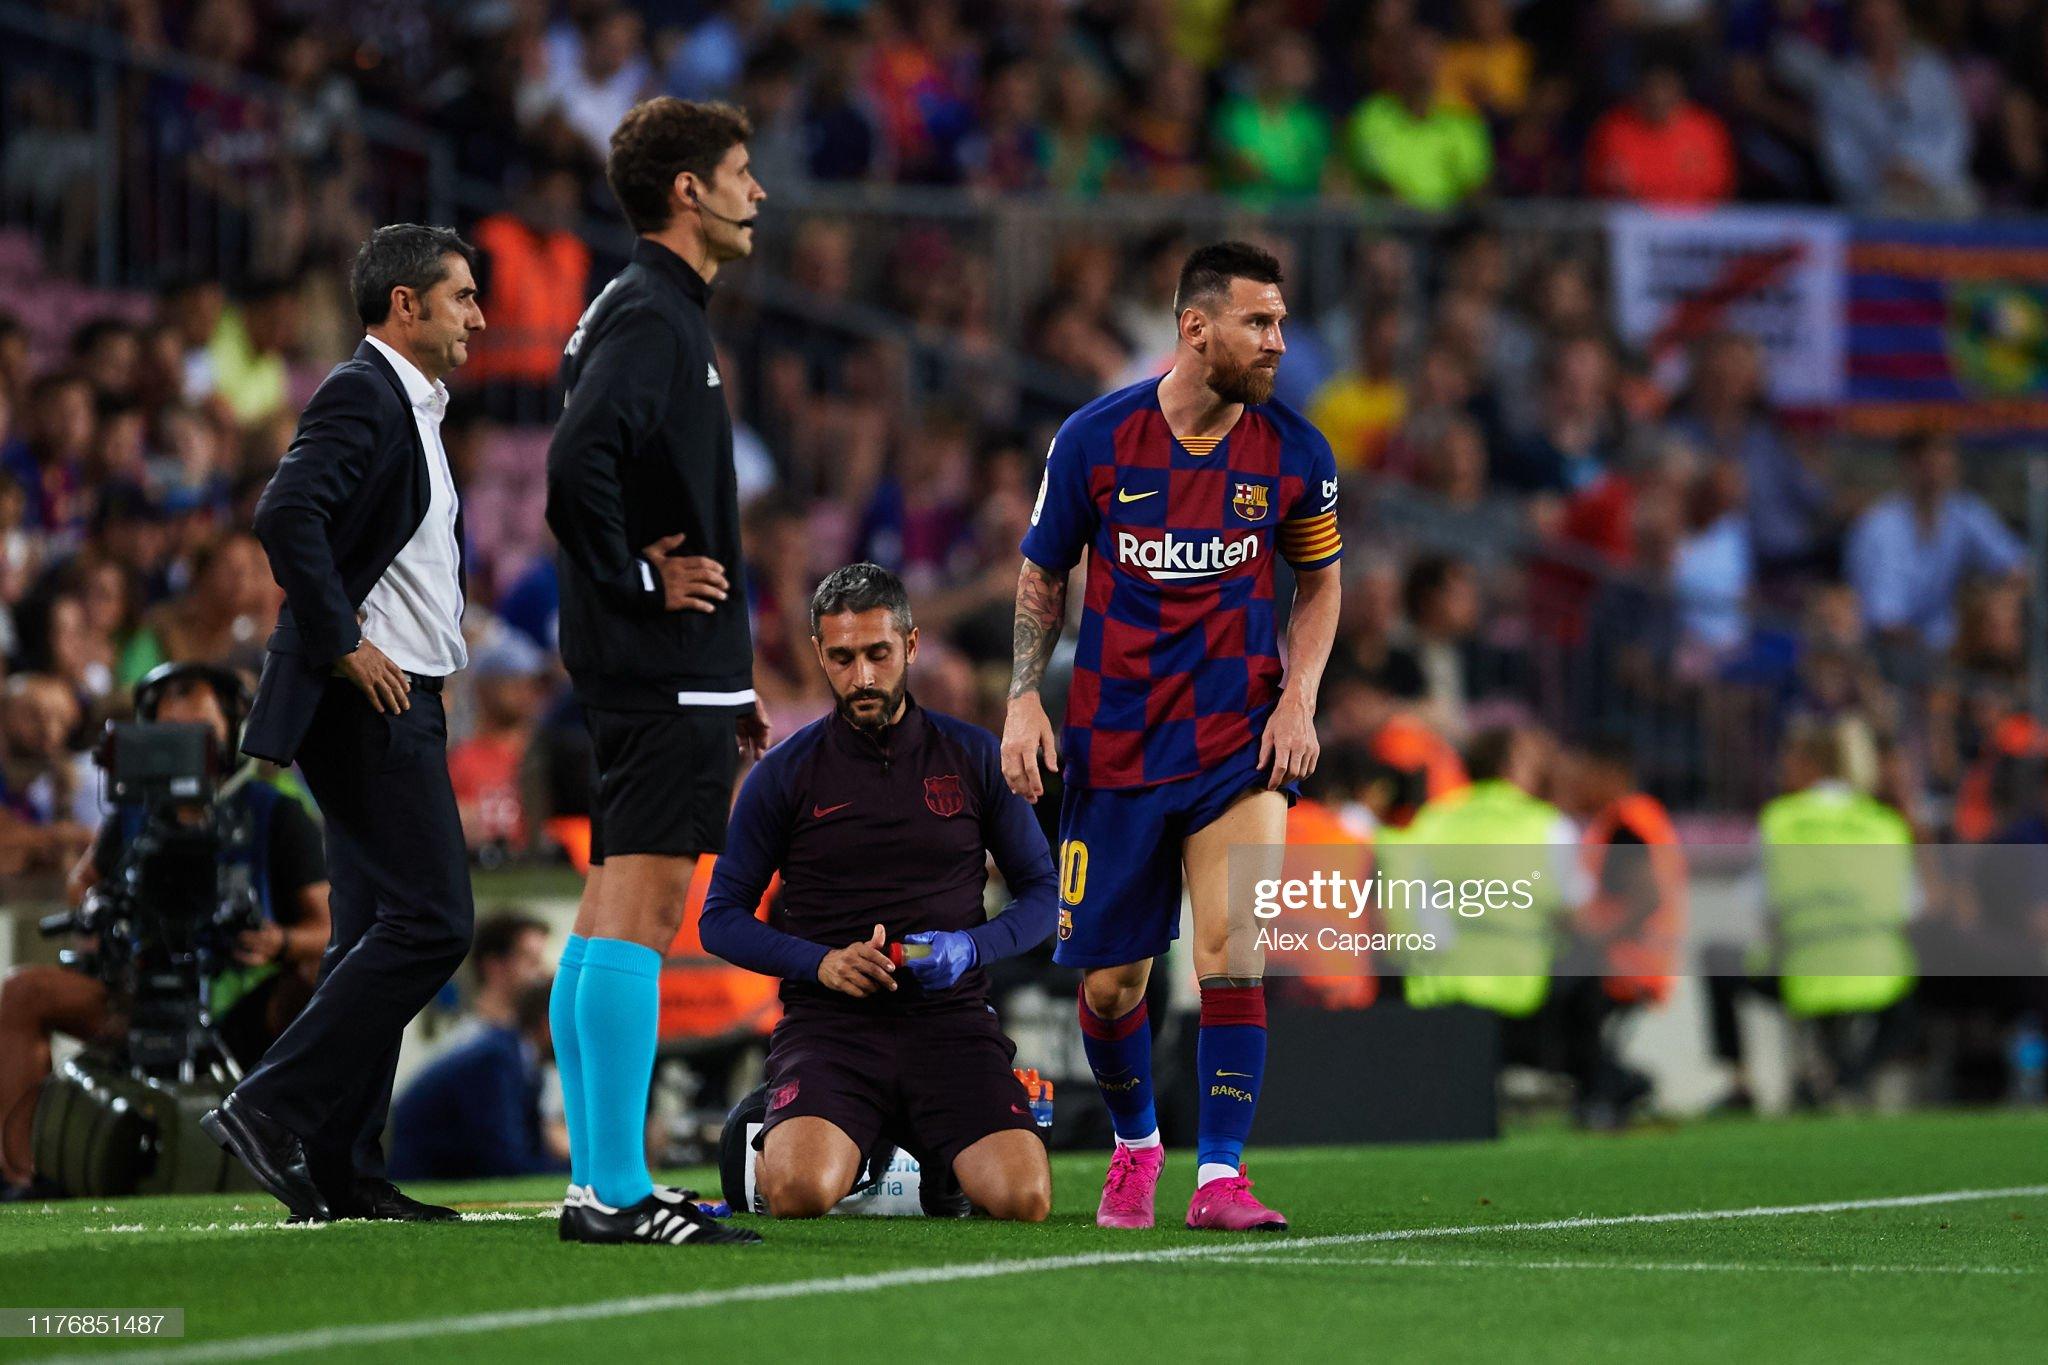 صور مباراة : برشلونة - فياريال 2-1 ( 24-09-2019 )  Lionel-messi-of-fc-barcelona-receives-medical-treatment-during-the-picture-id1176851487?s=2048x2048